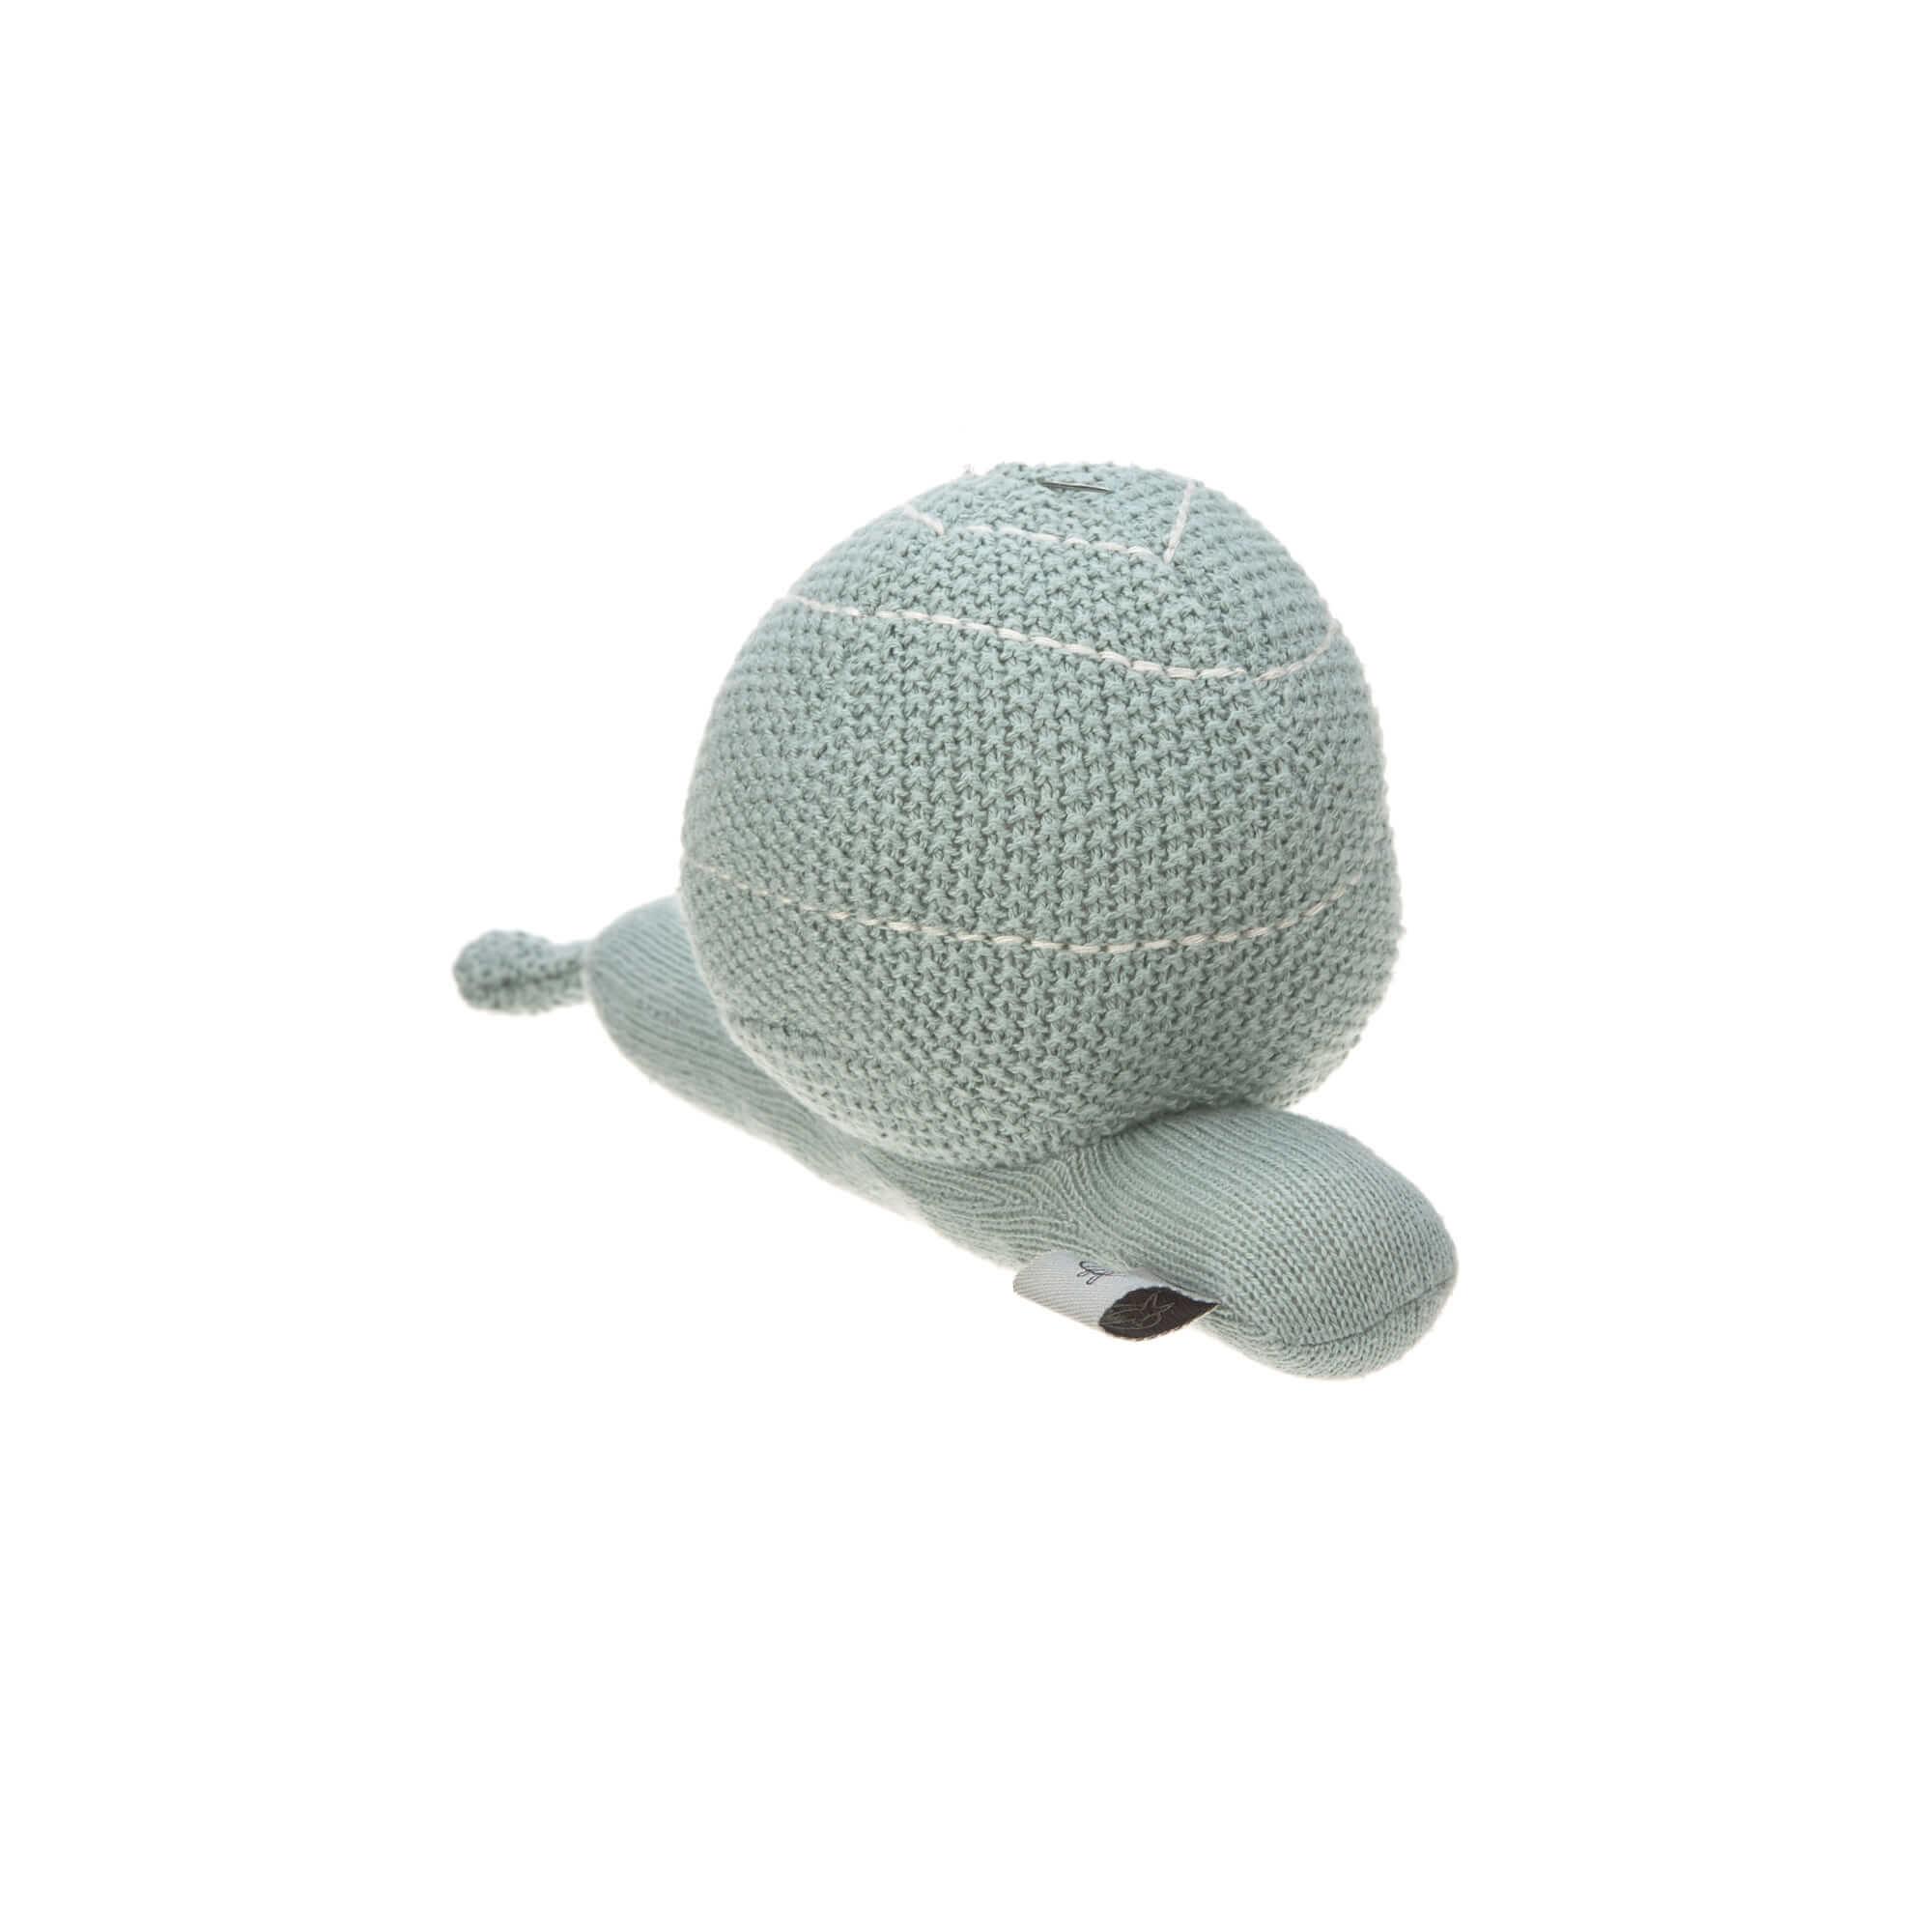 Lässig Lässig gebreid speeltje en knuffel met rammelaar Garden Explorer Snail blue